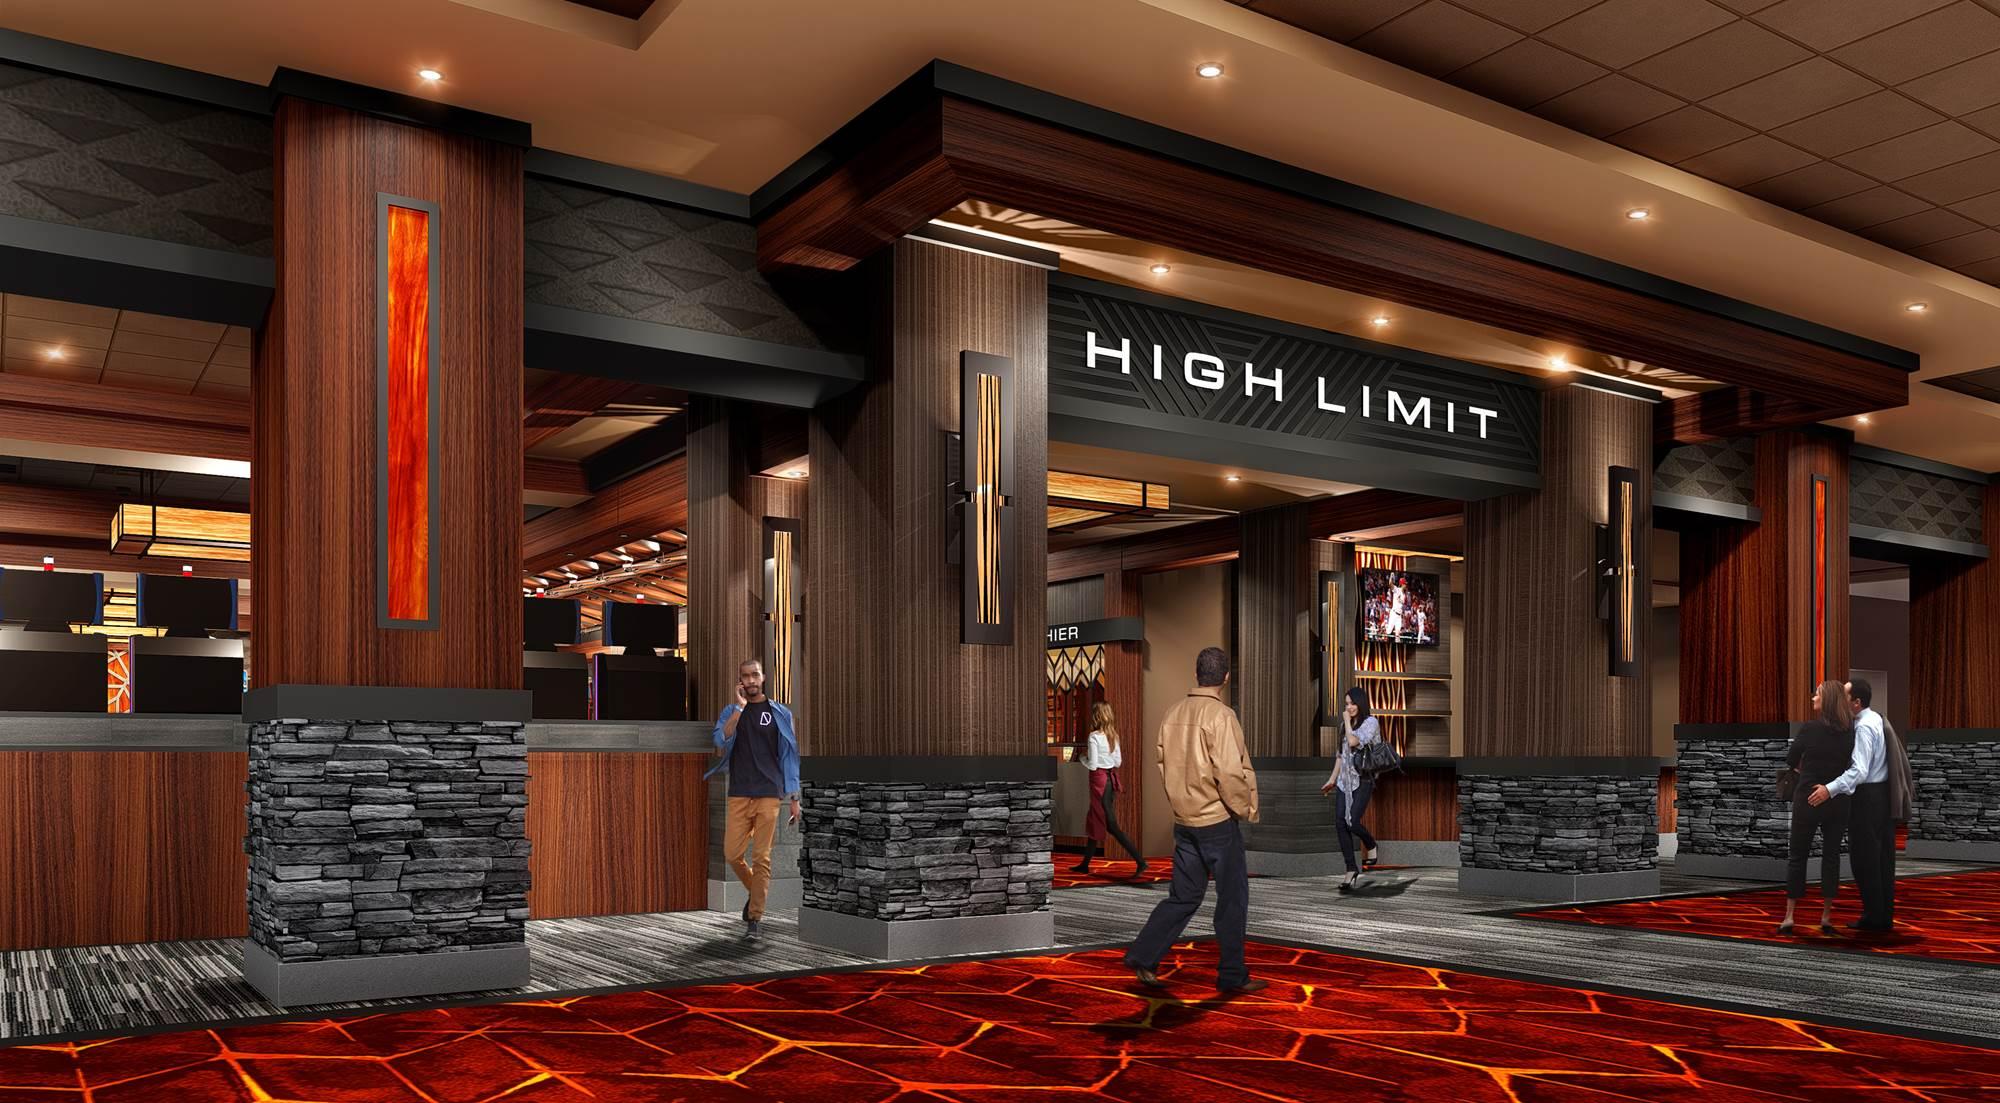 Source: Soaring Eagle Casino & Resort